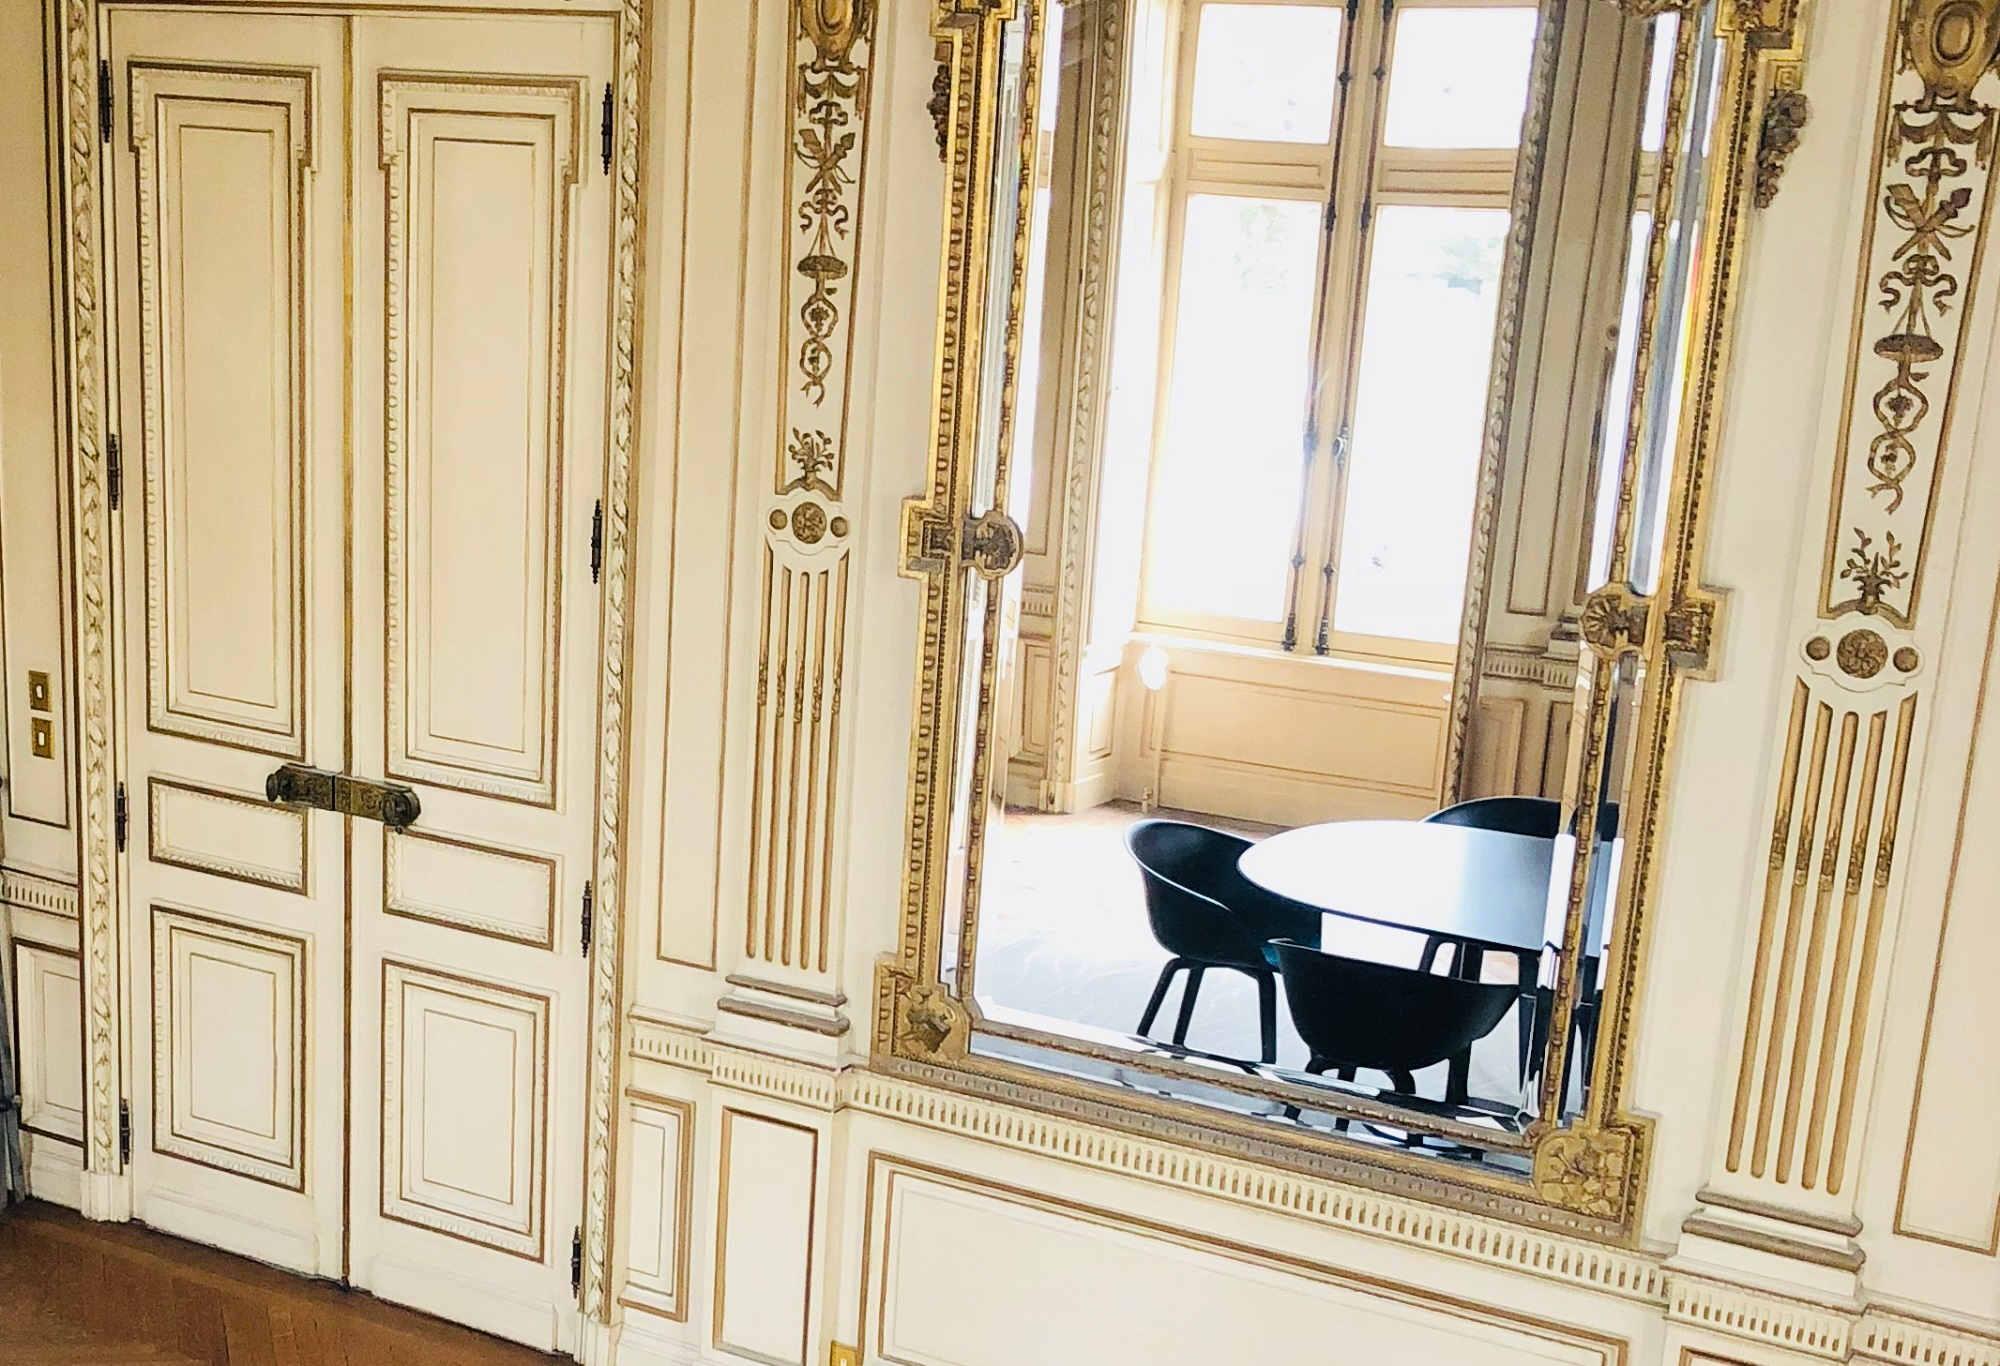 Office notarial à Nantes